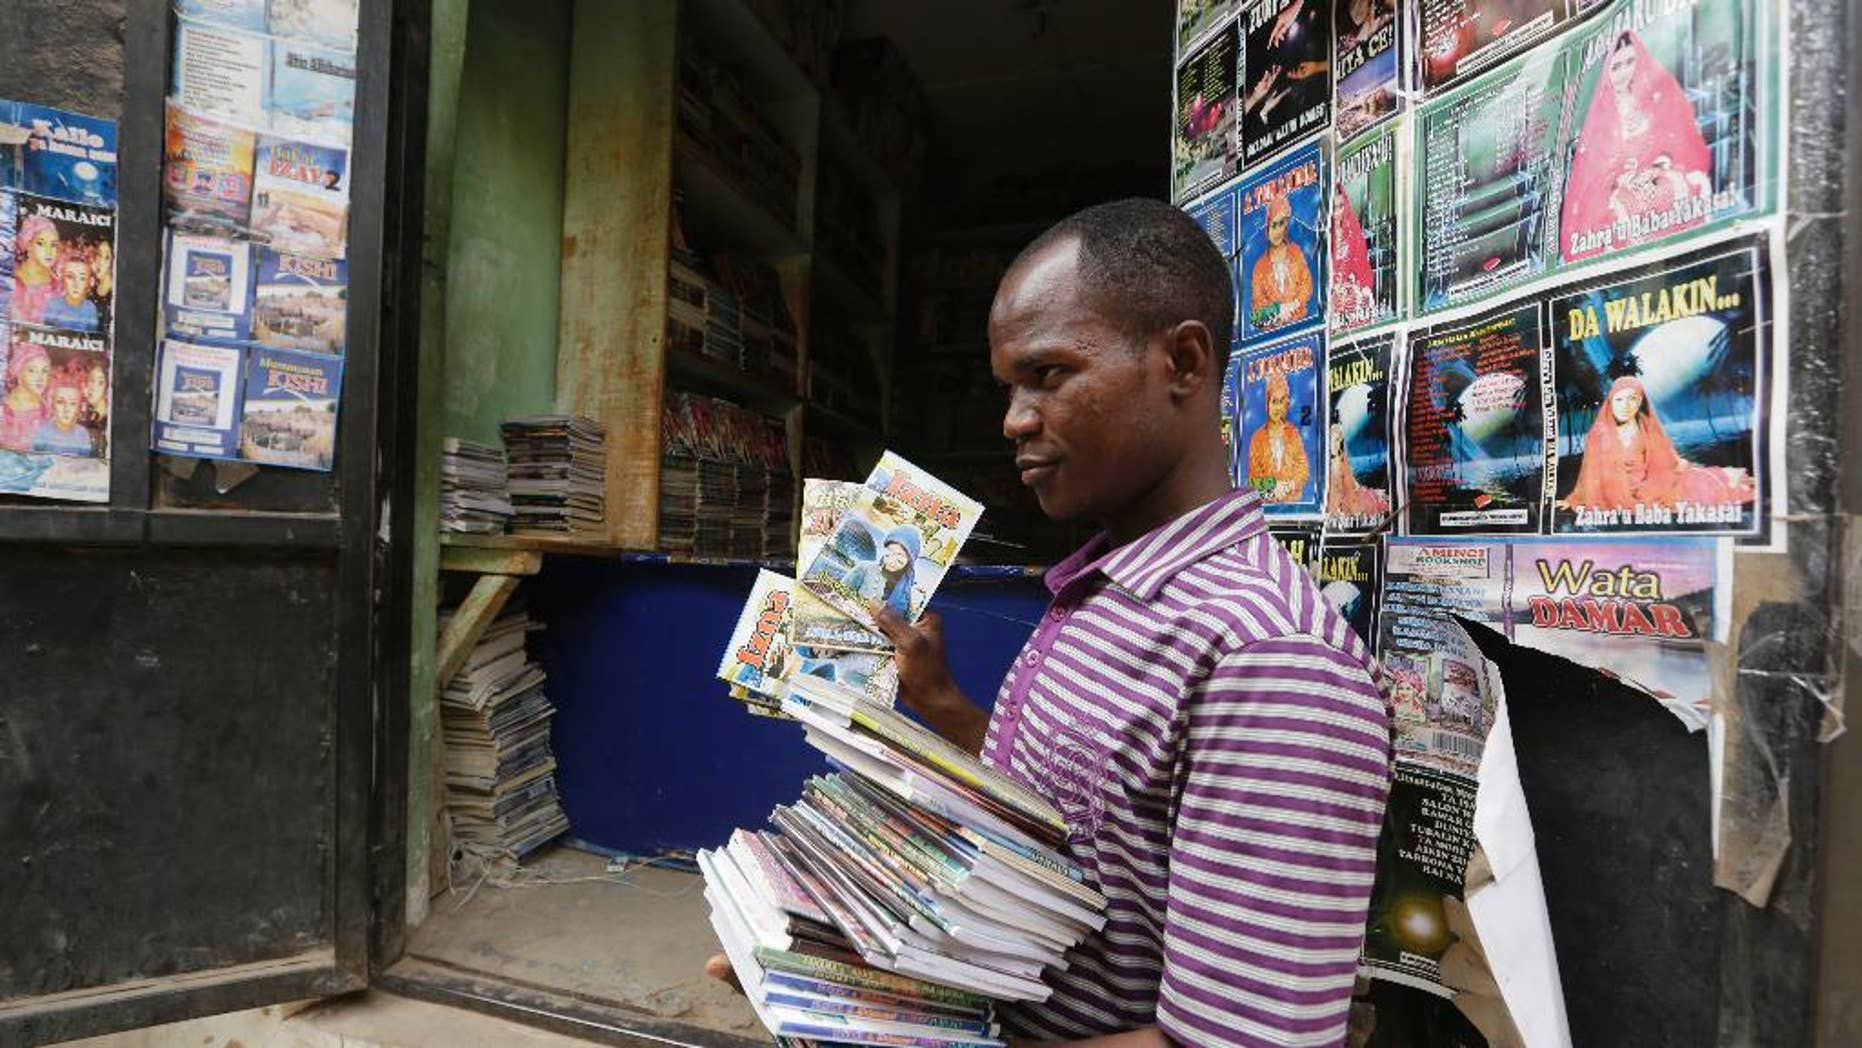 Romance novellas by women in Nigeria challenge traditions | Fox News